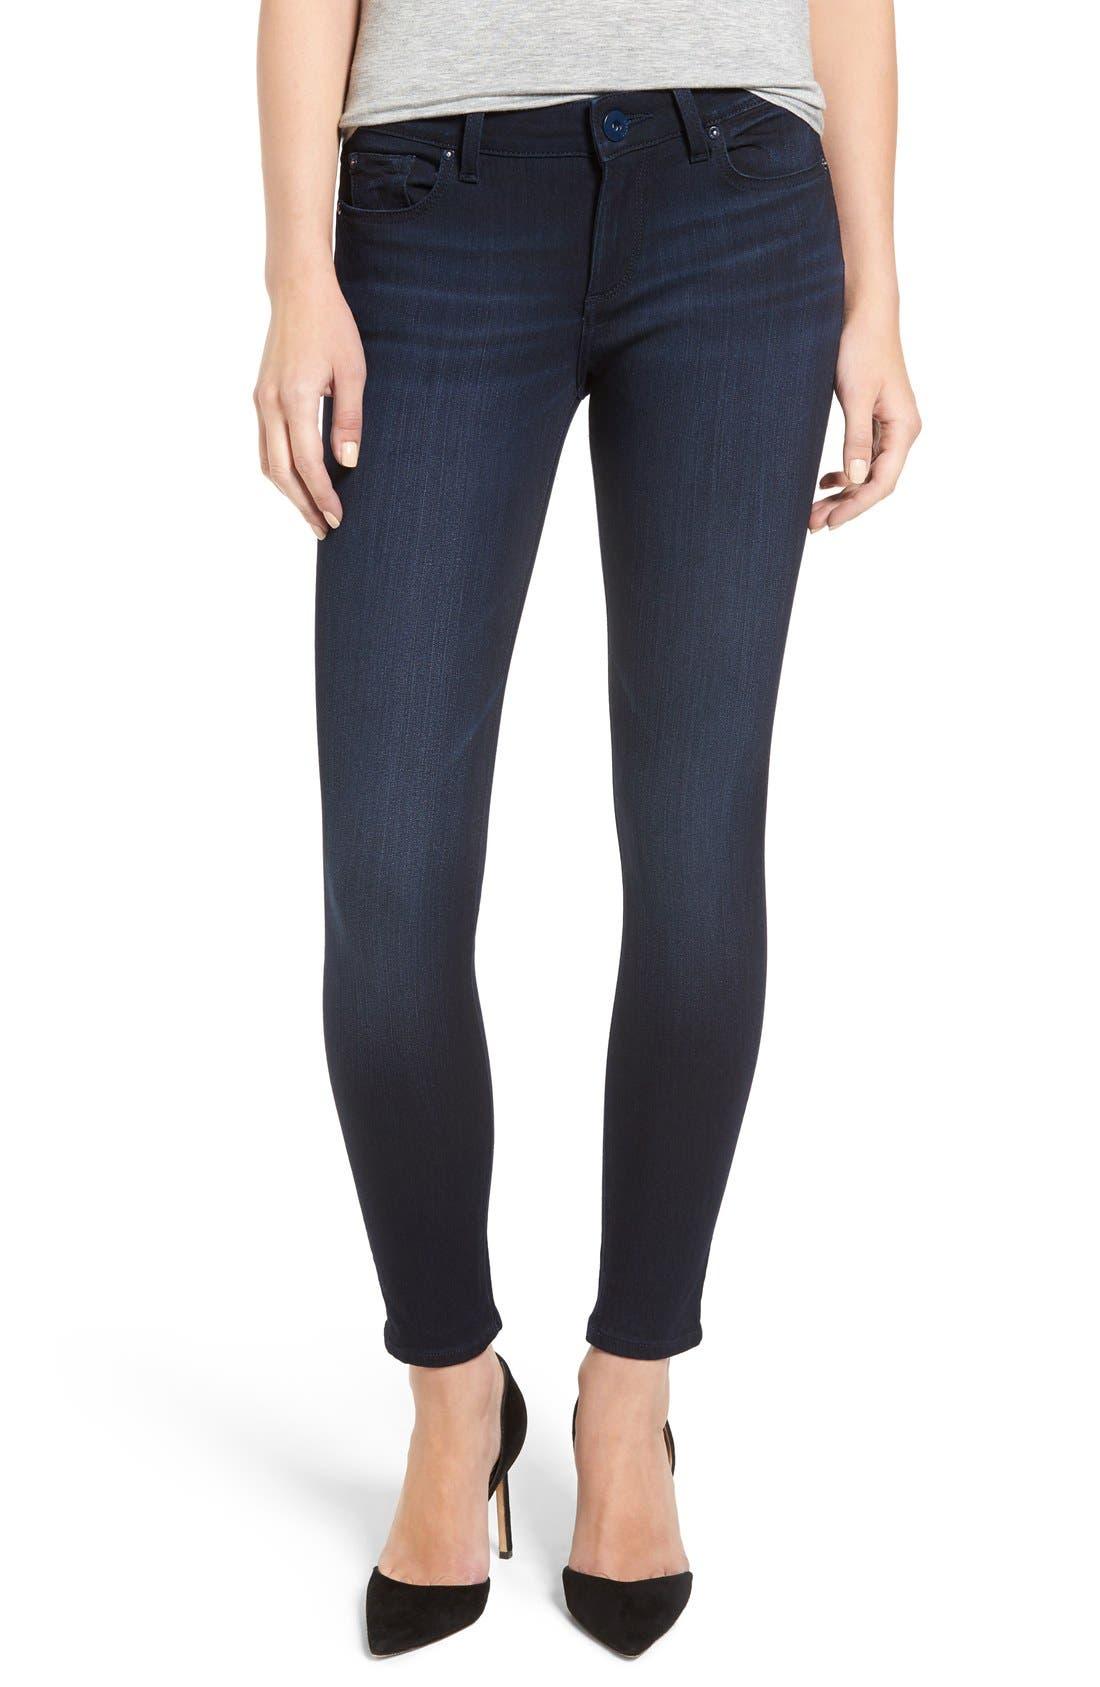 'Emma' Power Legging Jeans,                             Alternate thumbnail 6, color,                             405